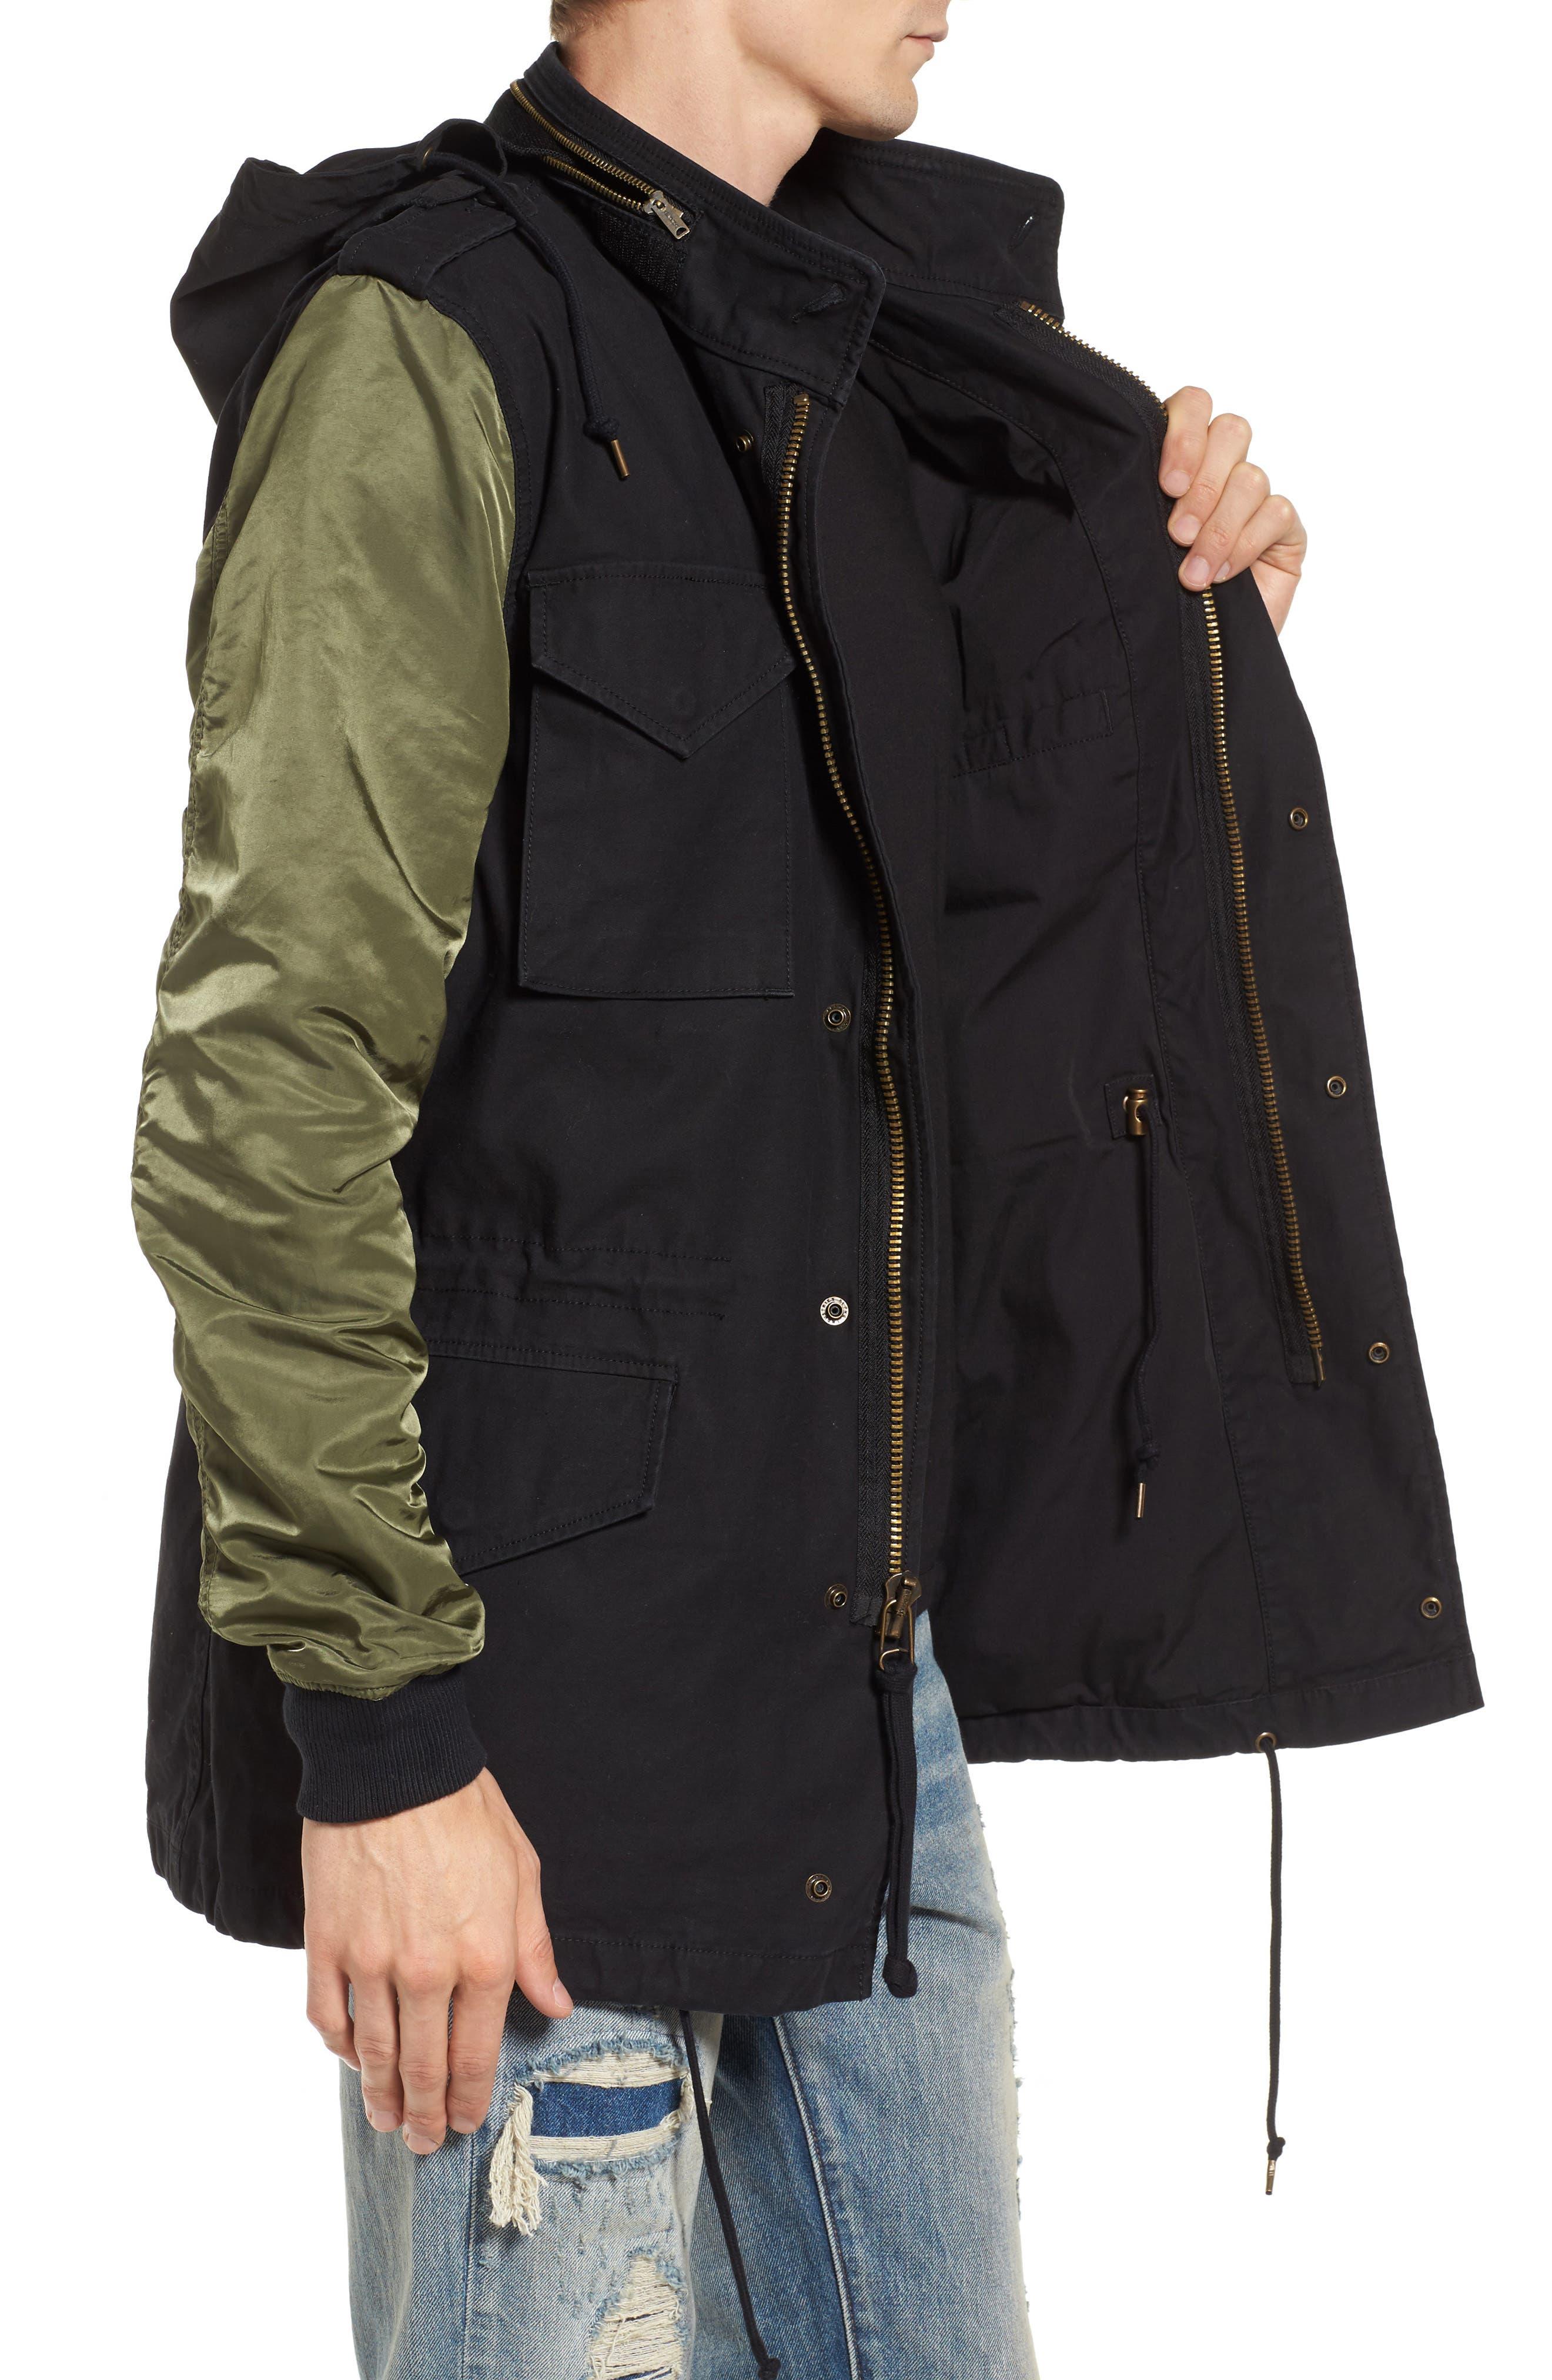 Fusion Field Coat,                             Alternate thumbnail 3, color,                             Black/ Sage